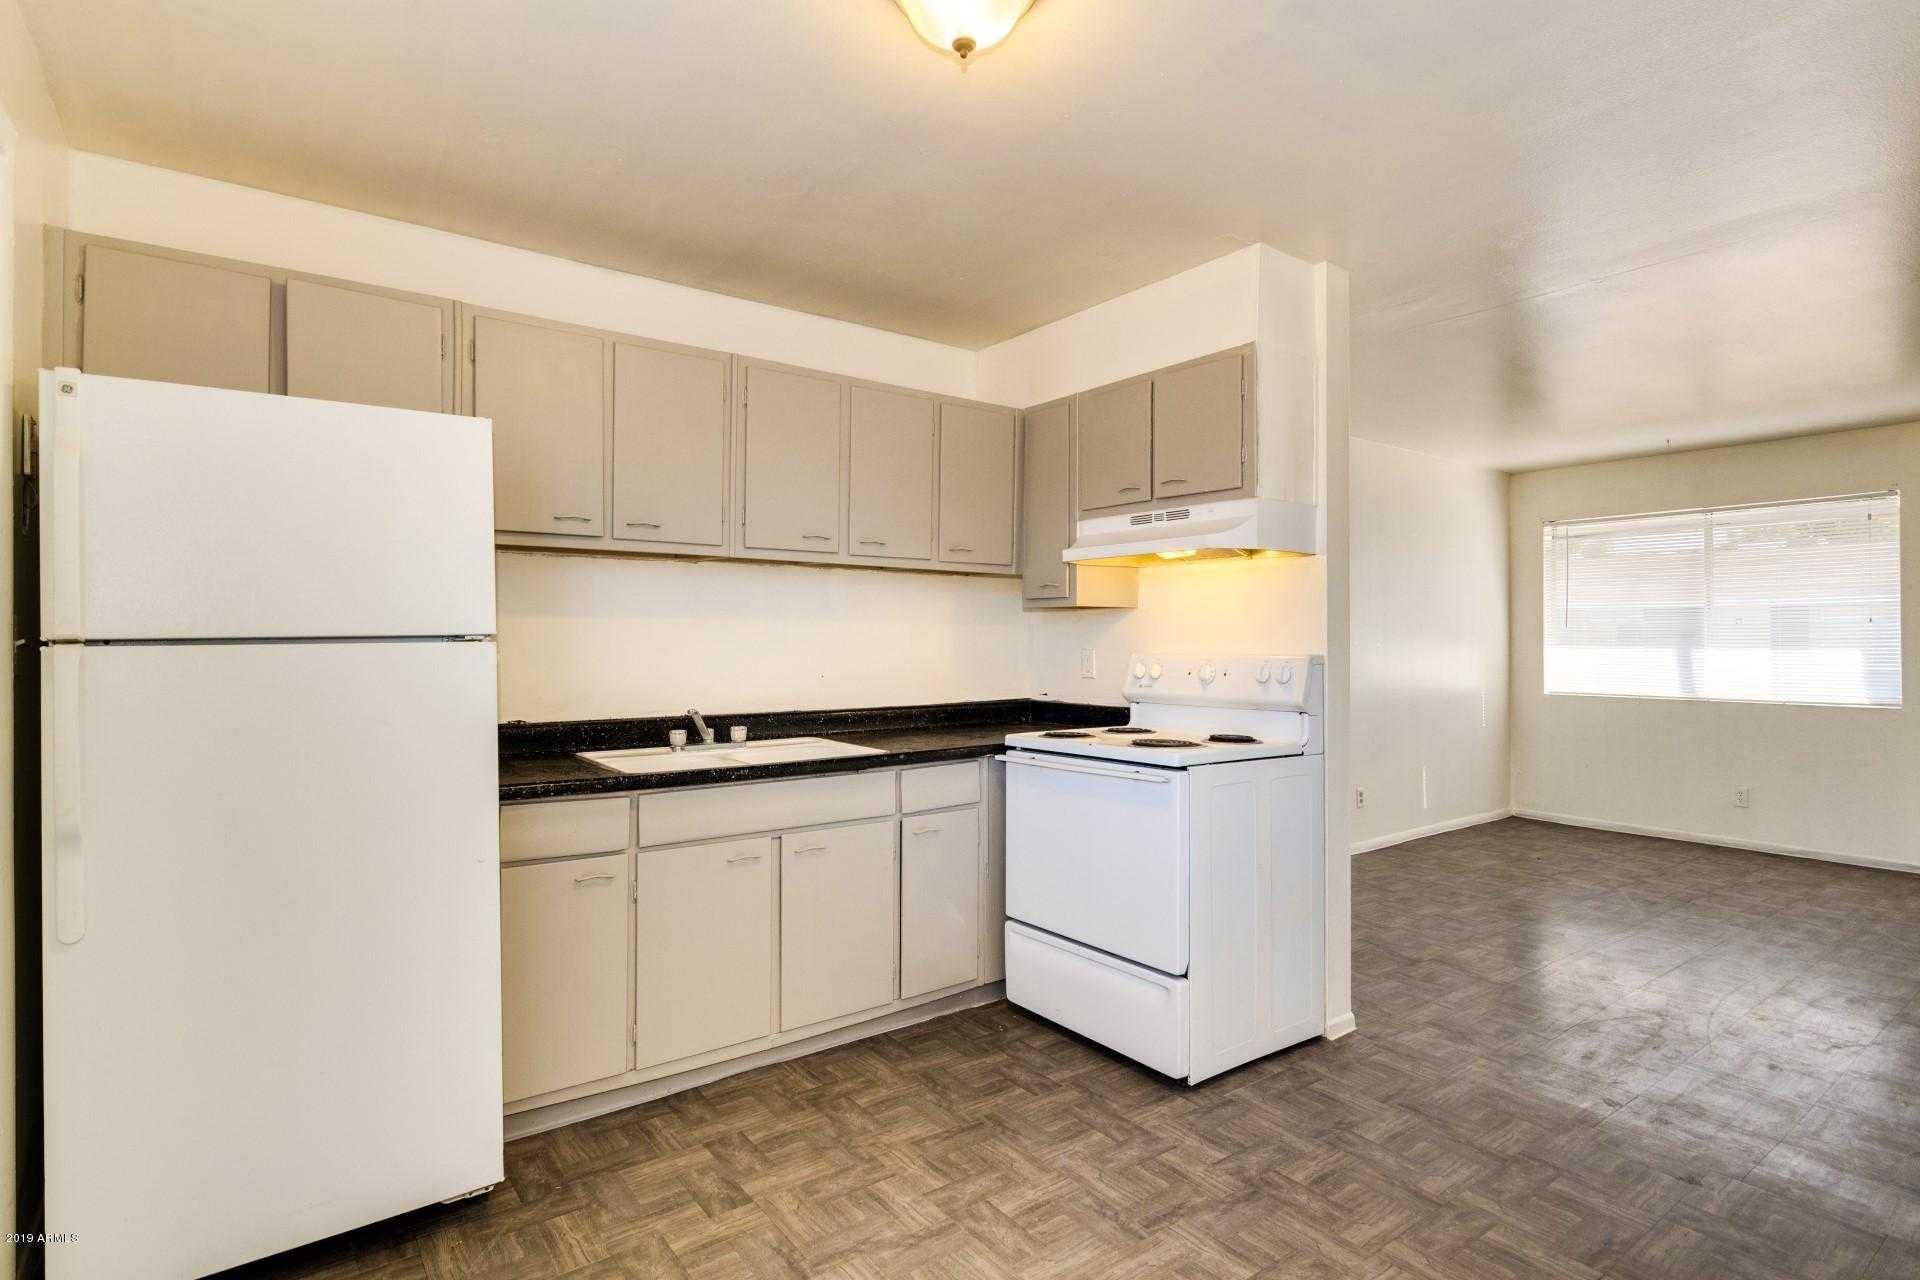 - 1Br/1Ba - Condo for Sale in Metes & Bounds, Phoenix